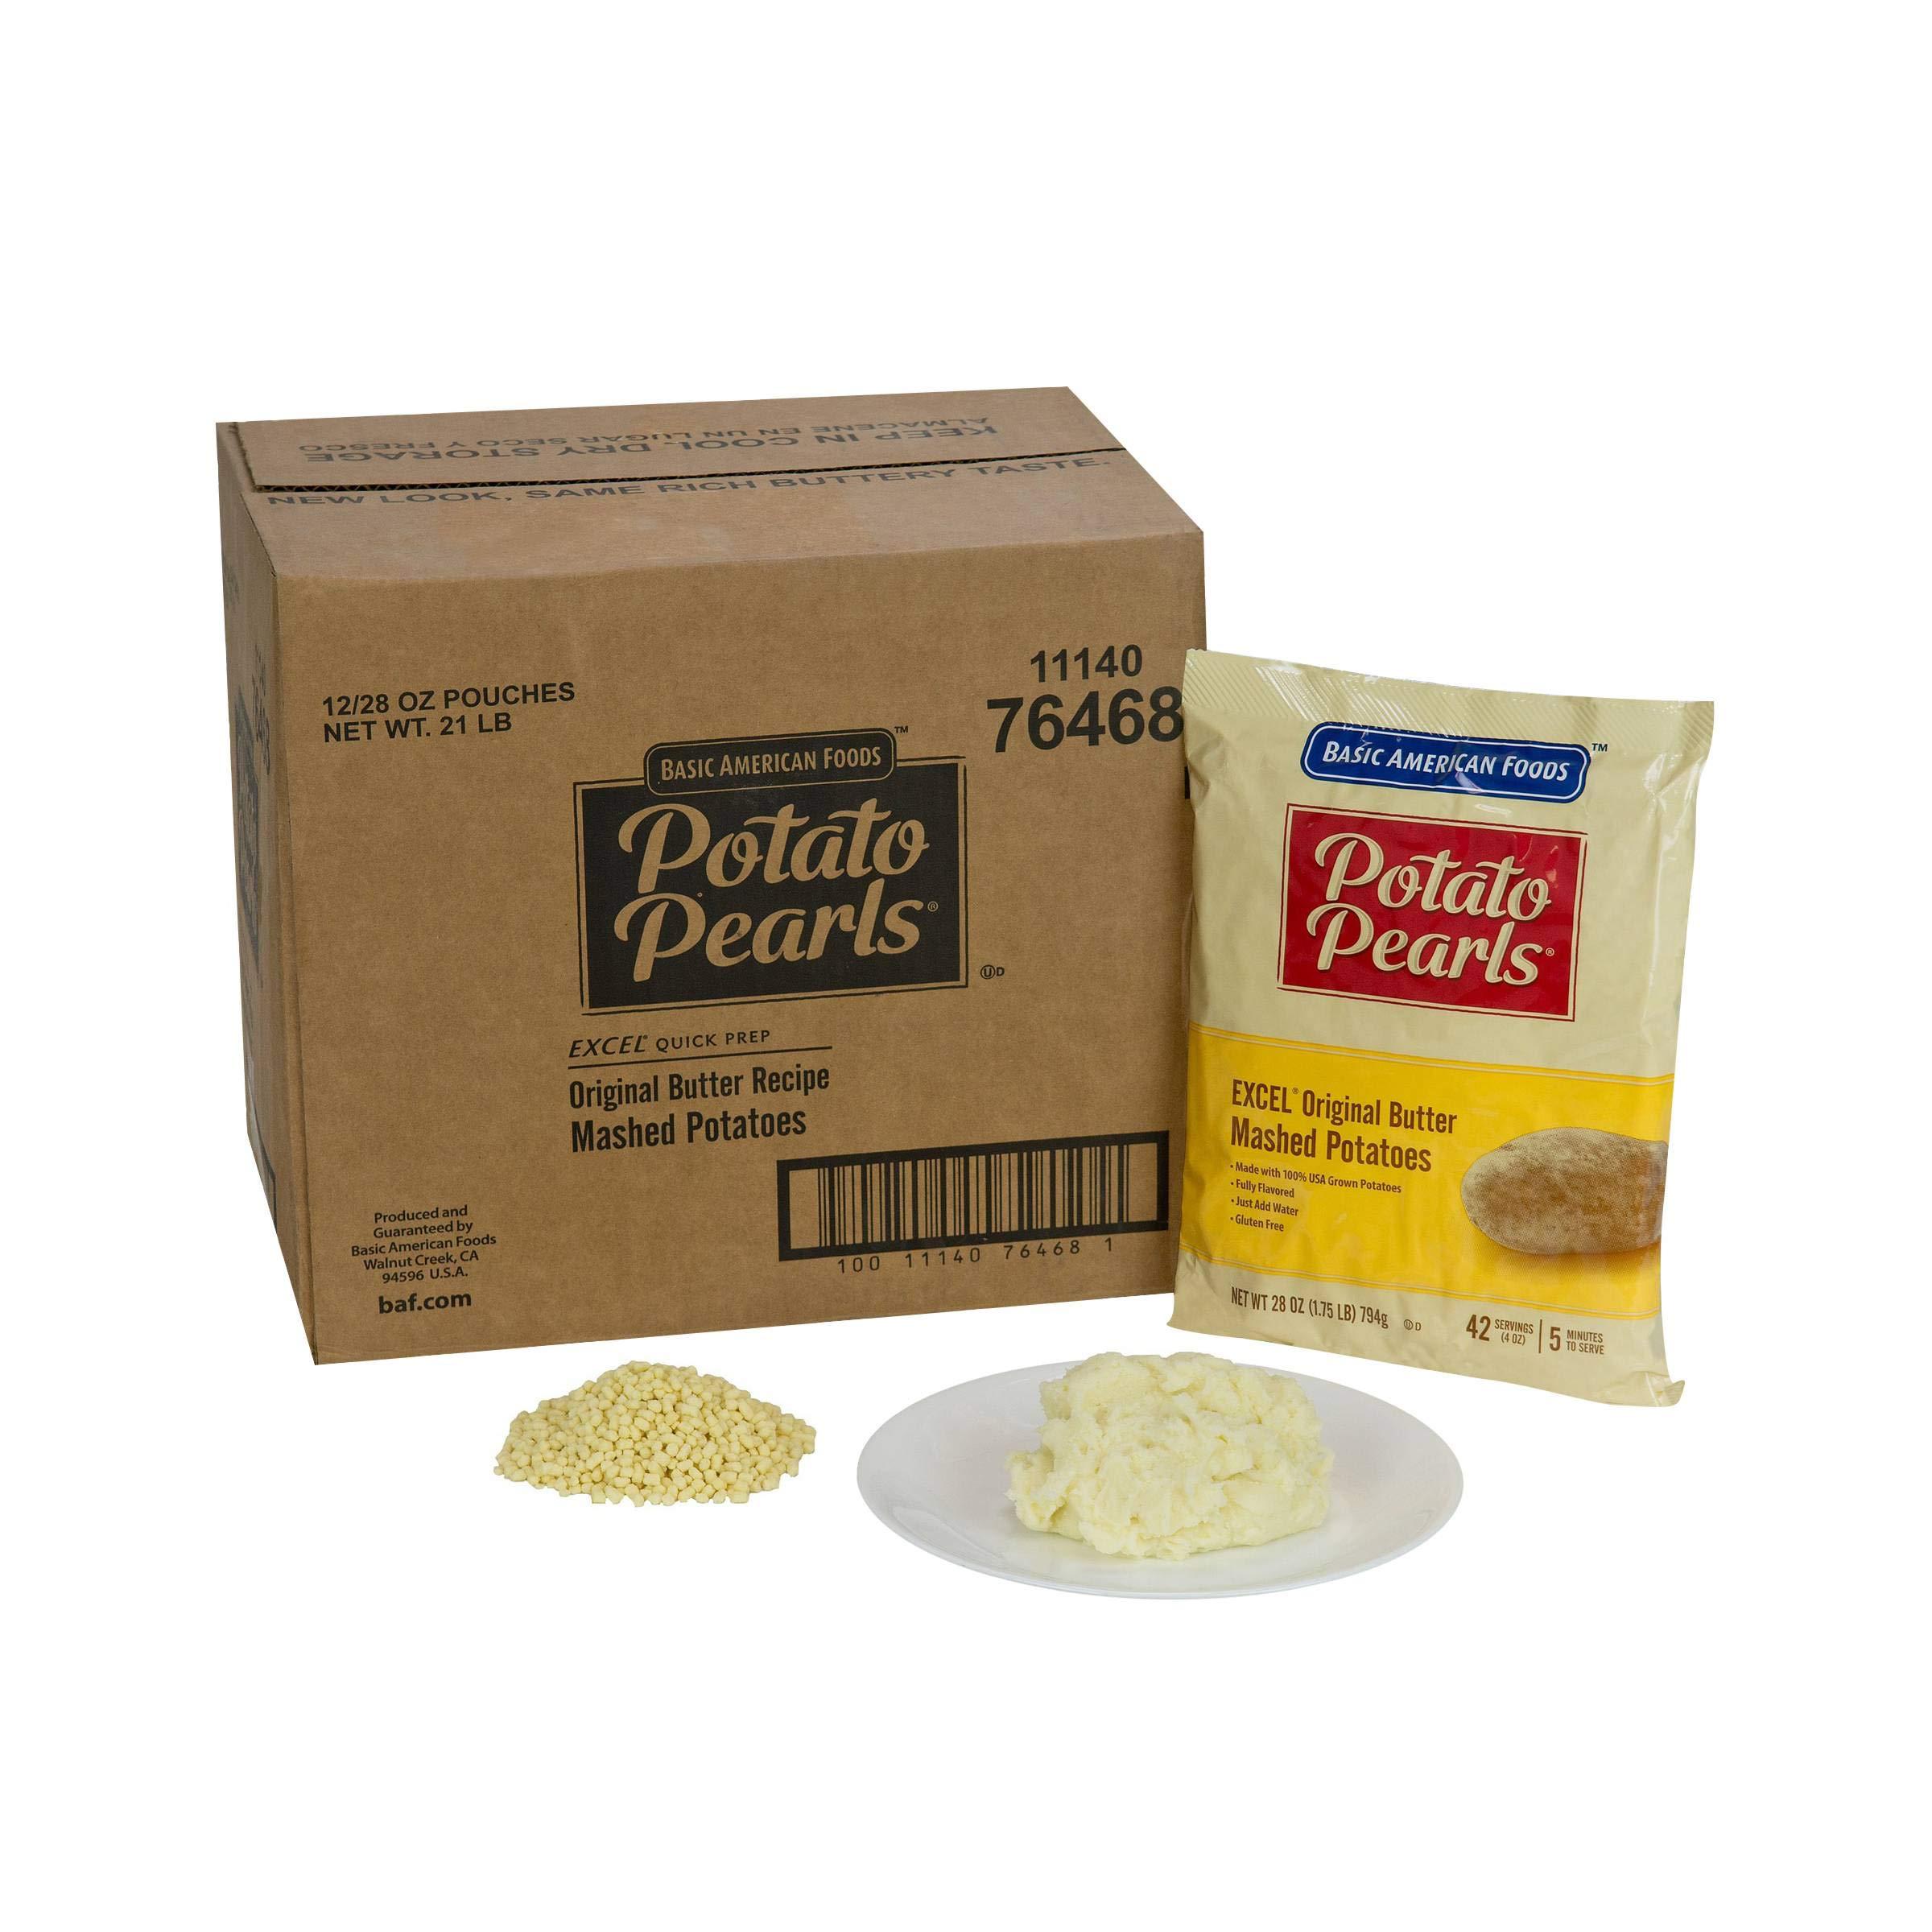 Excel Potato Pearls - 28 oz. pouch, 12 pouches per case